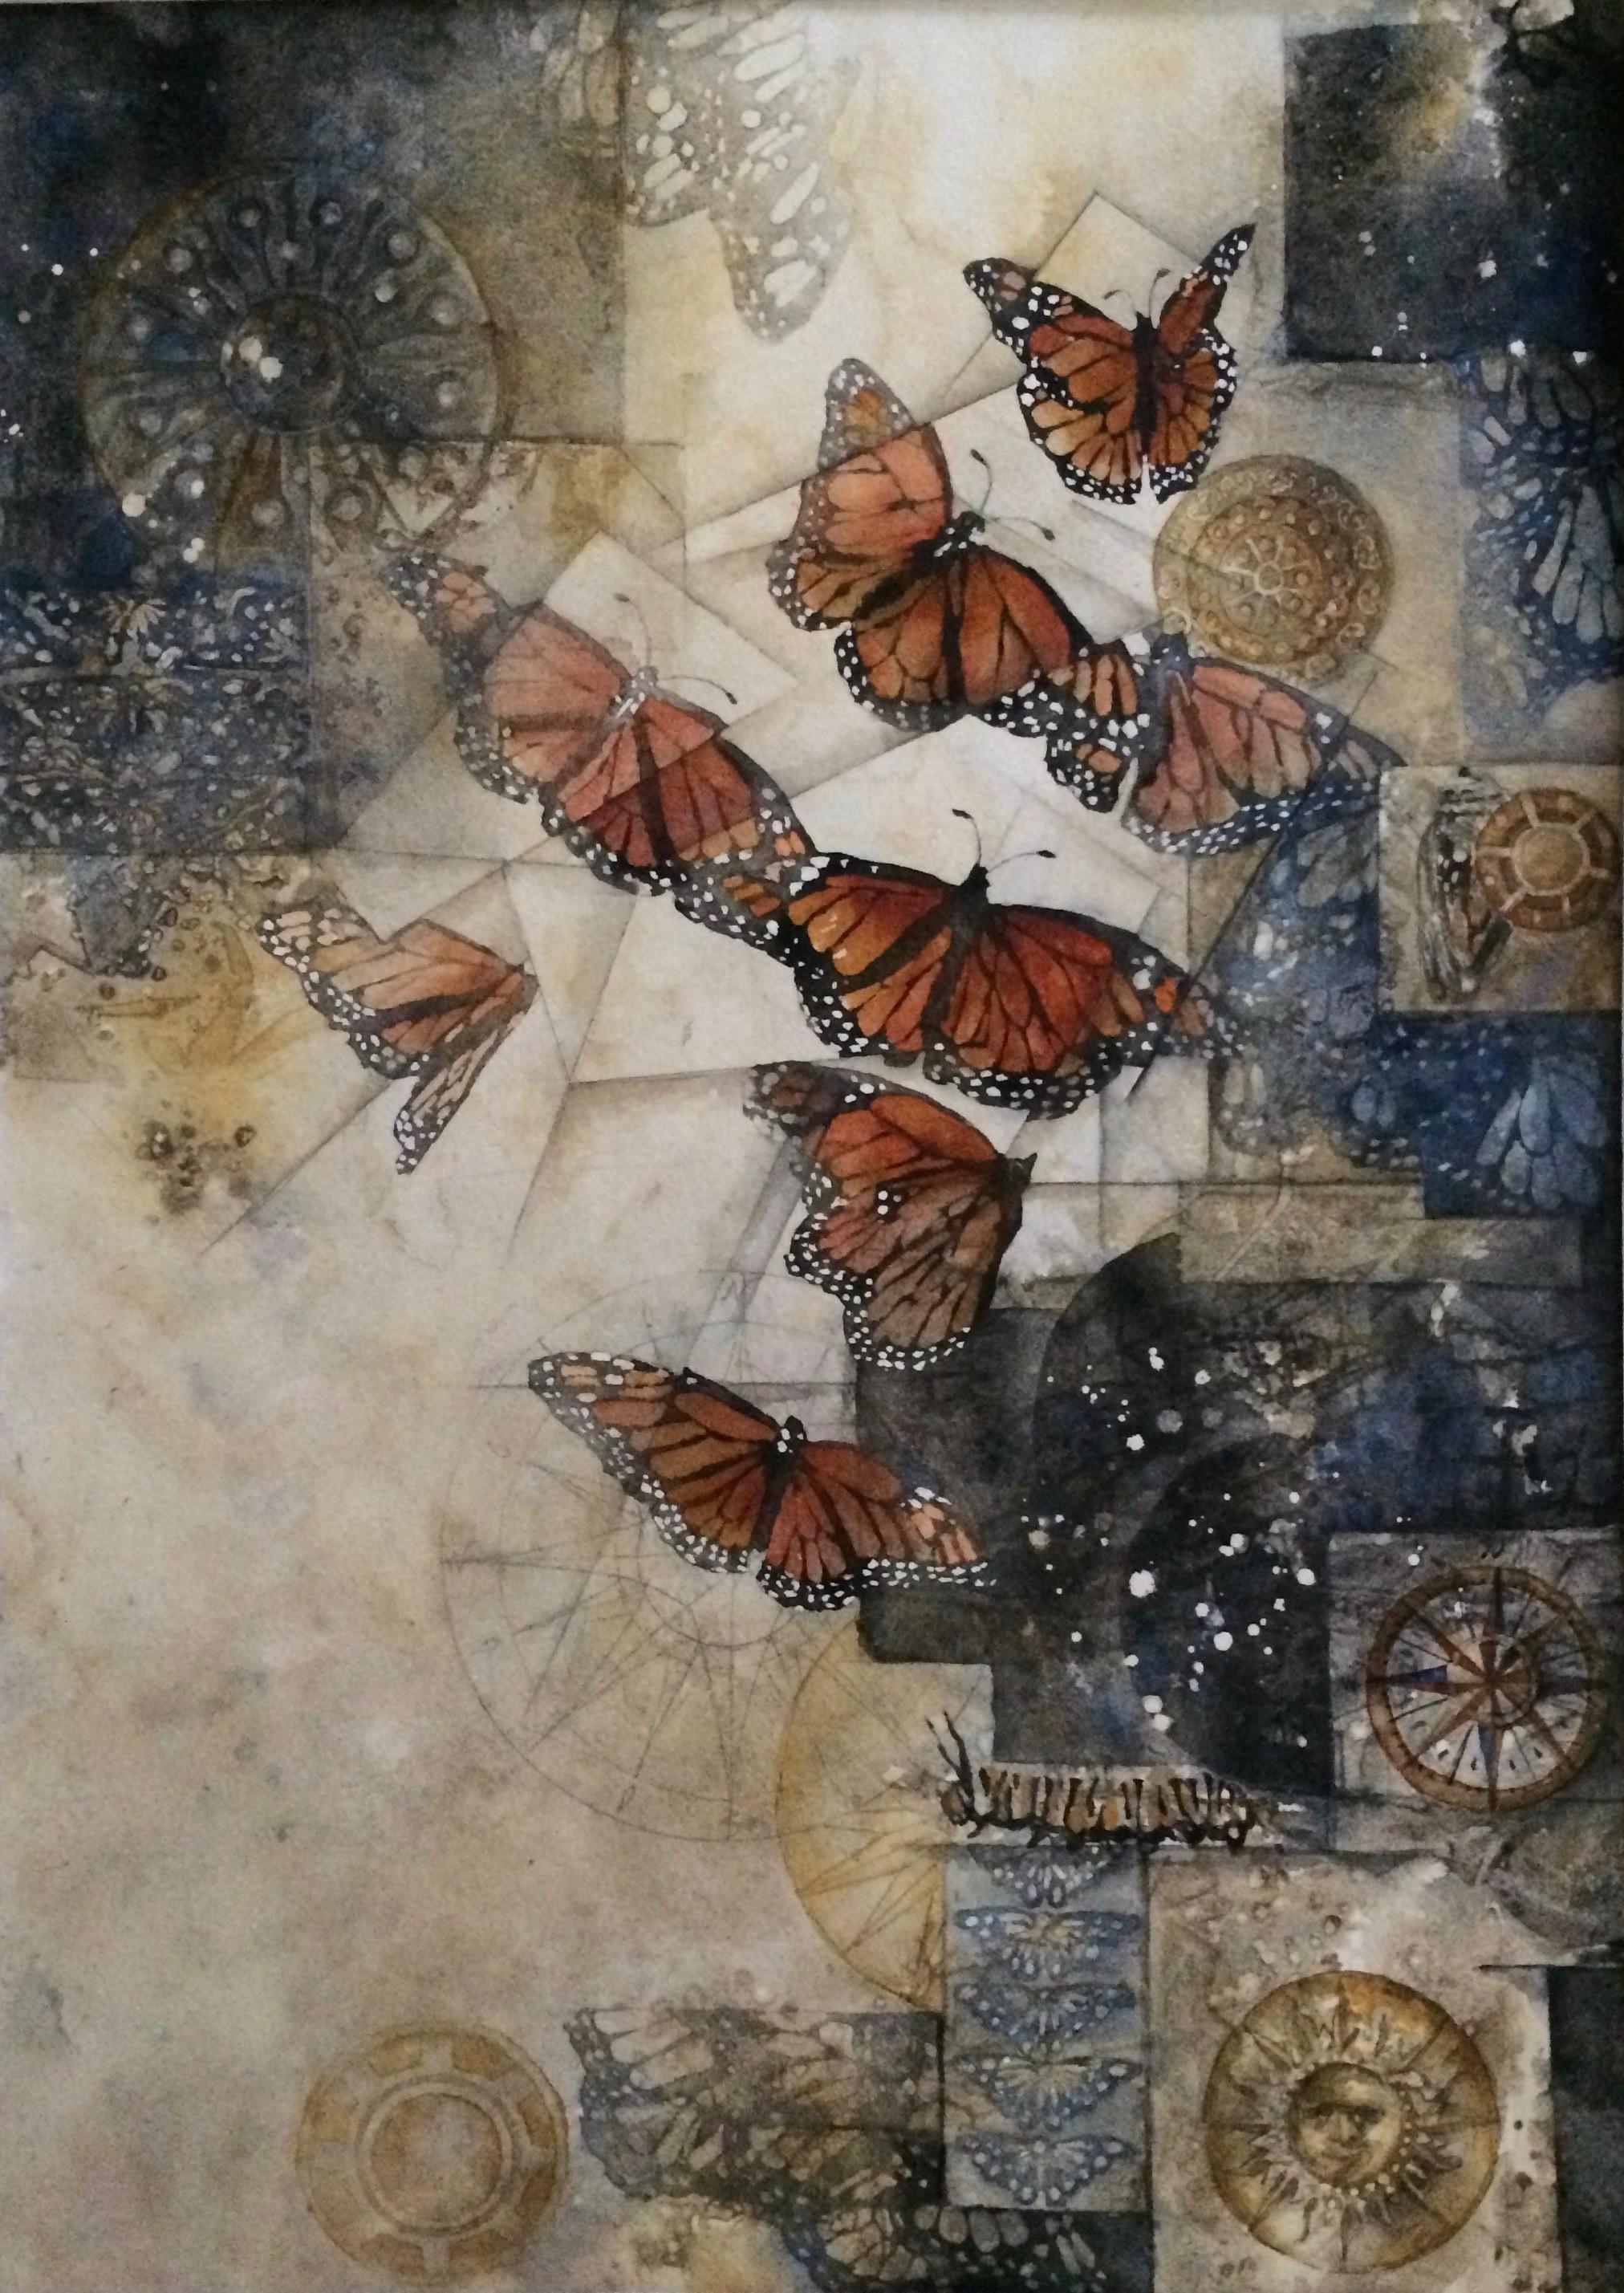 C. A. Evans Art Nature's Way